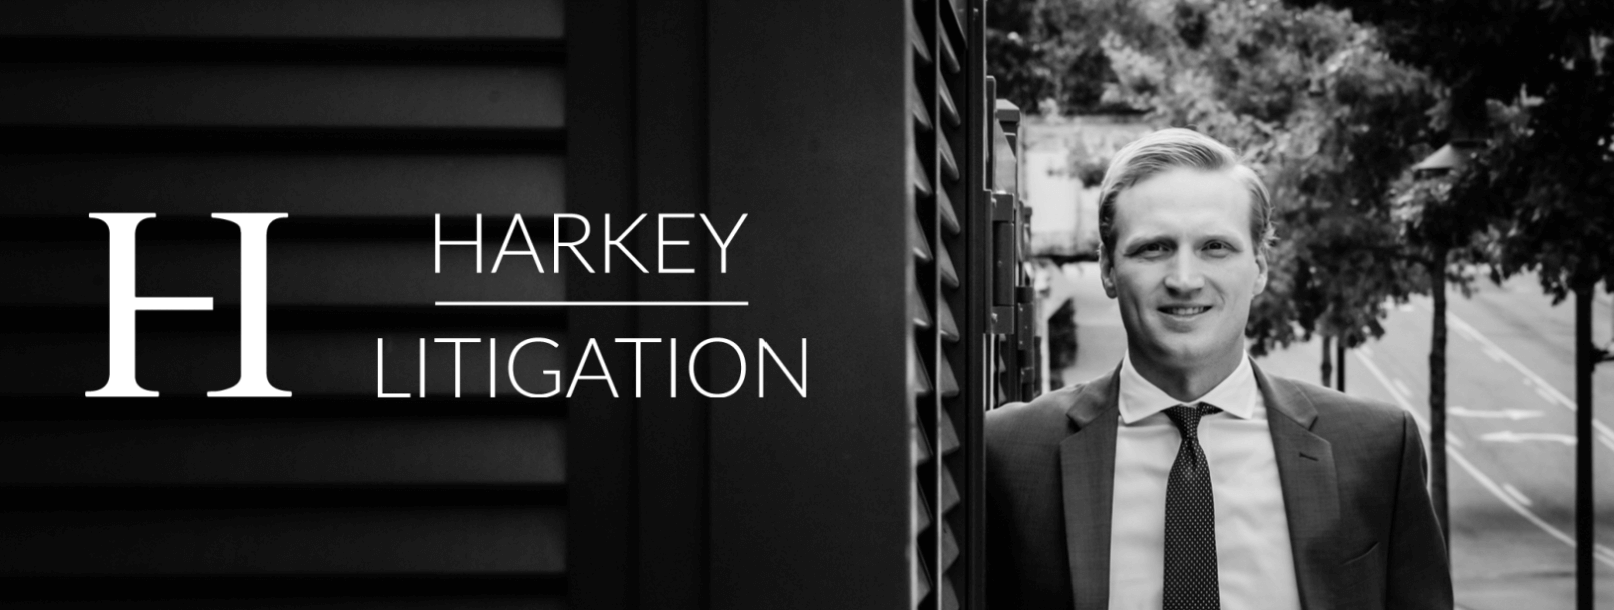 Harkey Litigation Law Firm